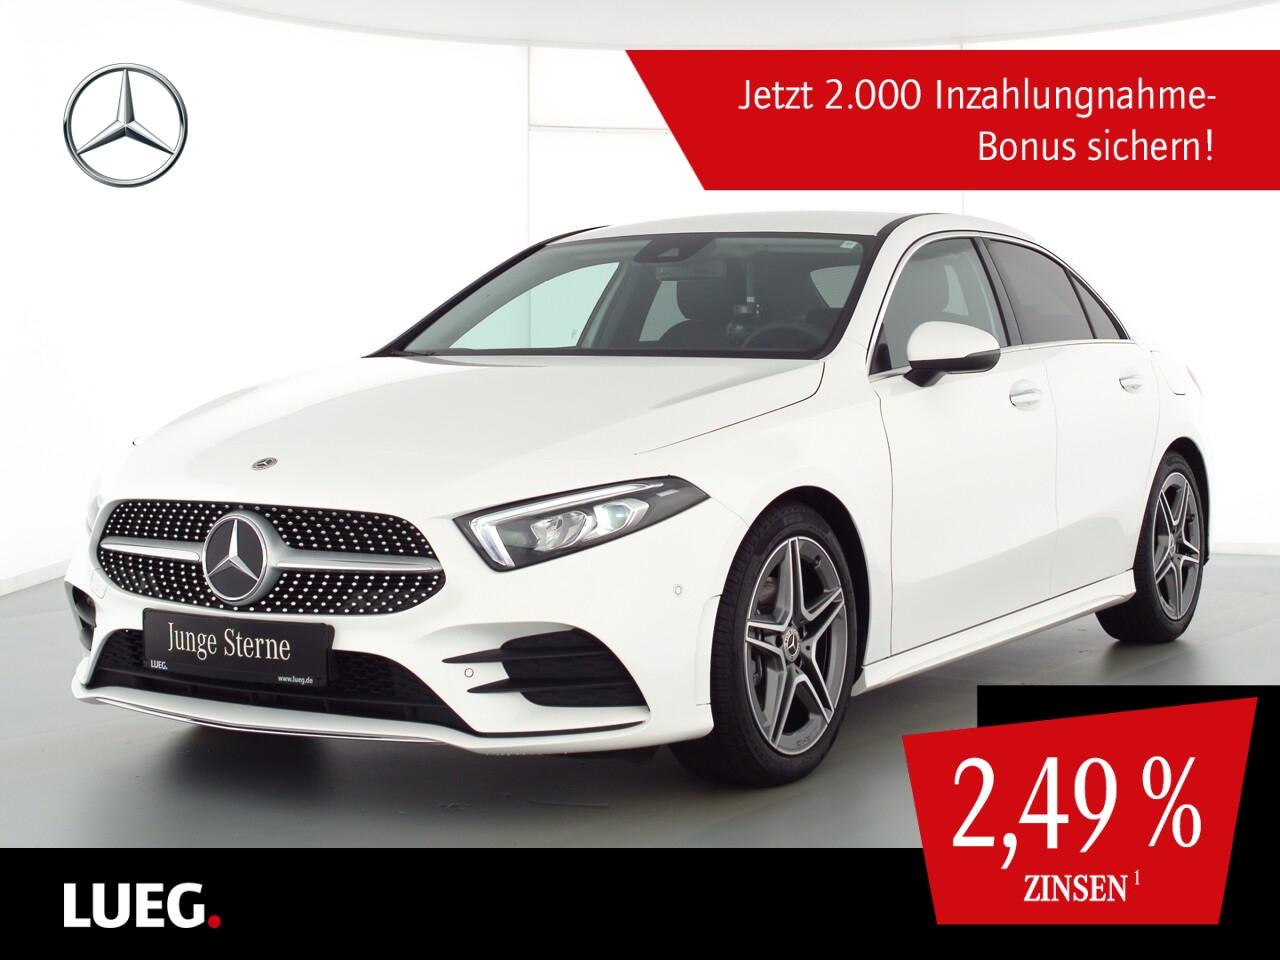 Mercedes-Benz A 180 d Lim AMG+MBUX+LED-HP+Sound+KeyGo+ParkA+RK, Jahr 2020, Diesel